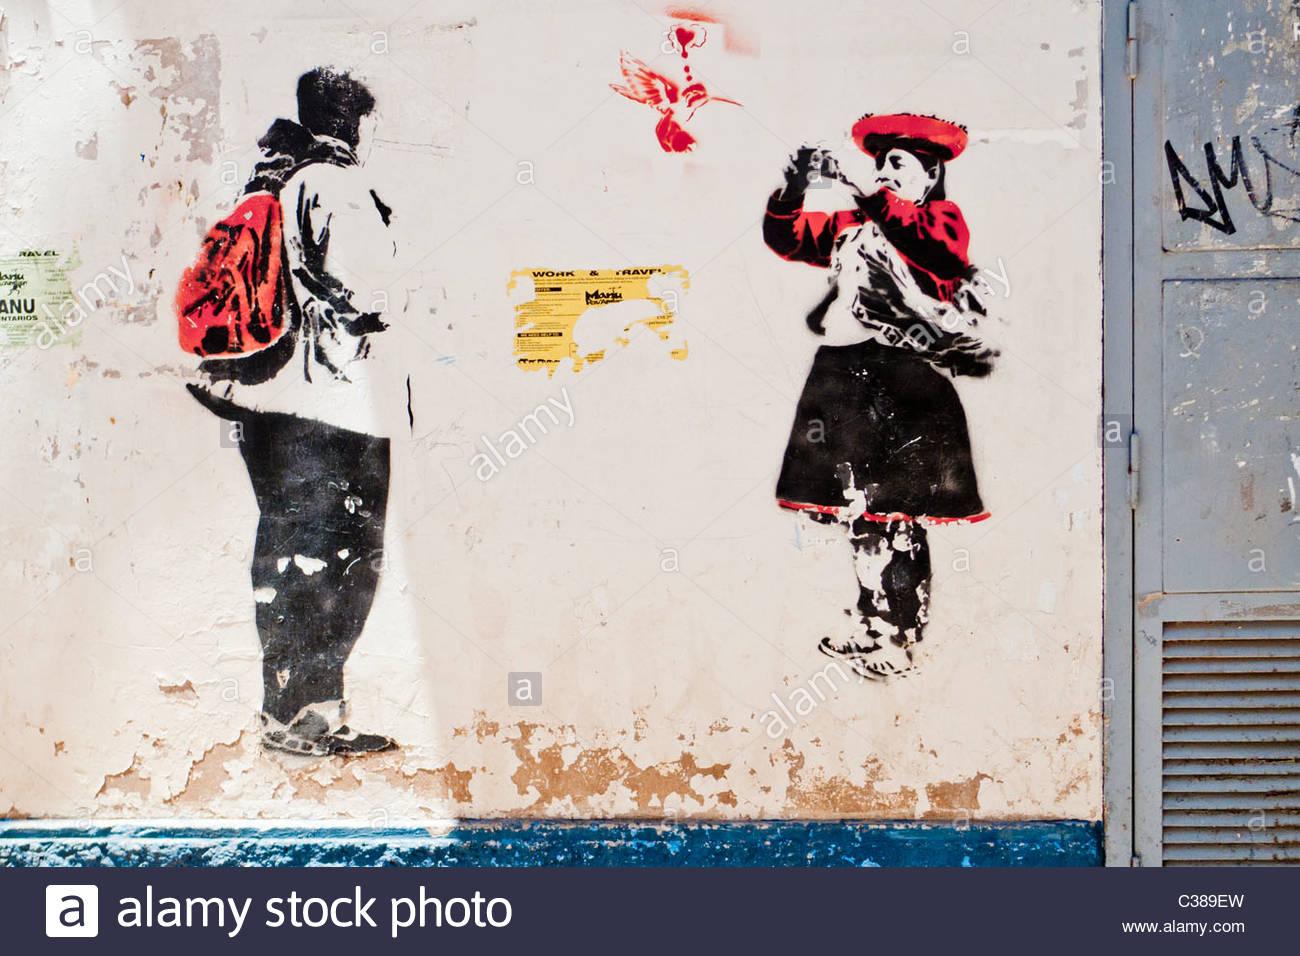 Graffiti in the tourist neighborhood of San Blas, Cusco. - Stock Image